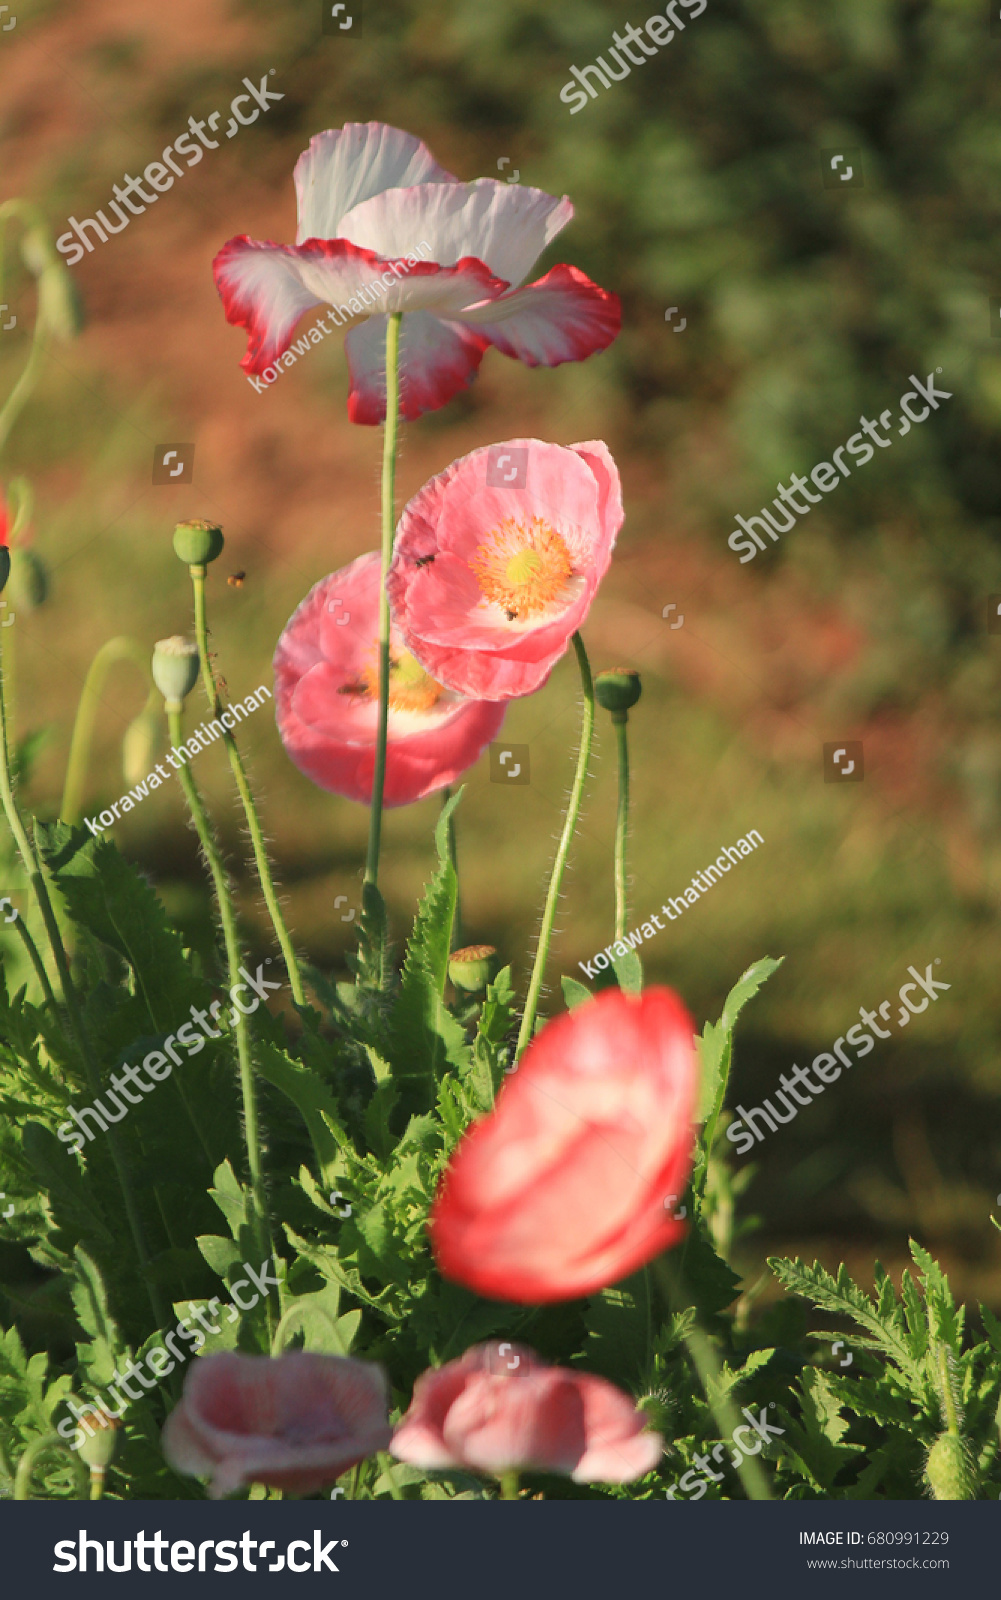 Opium Poppy Flowers Opium Poppy Papaver Somniferum Stock Photo